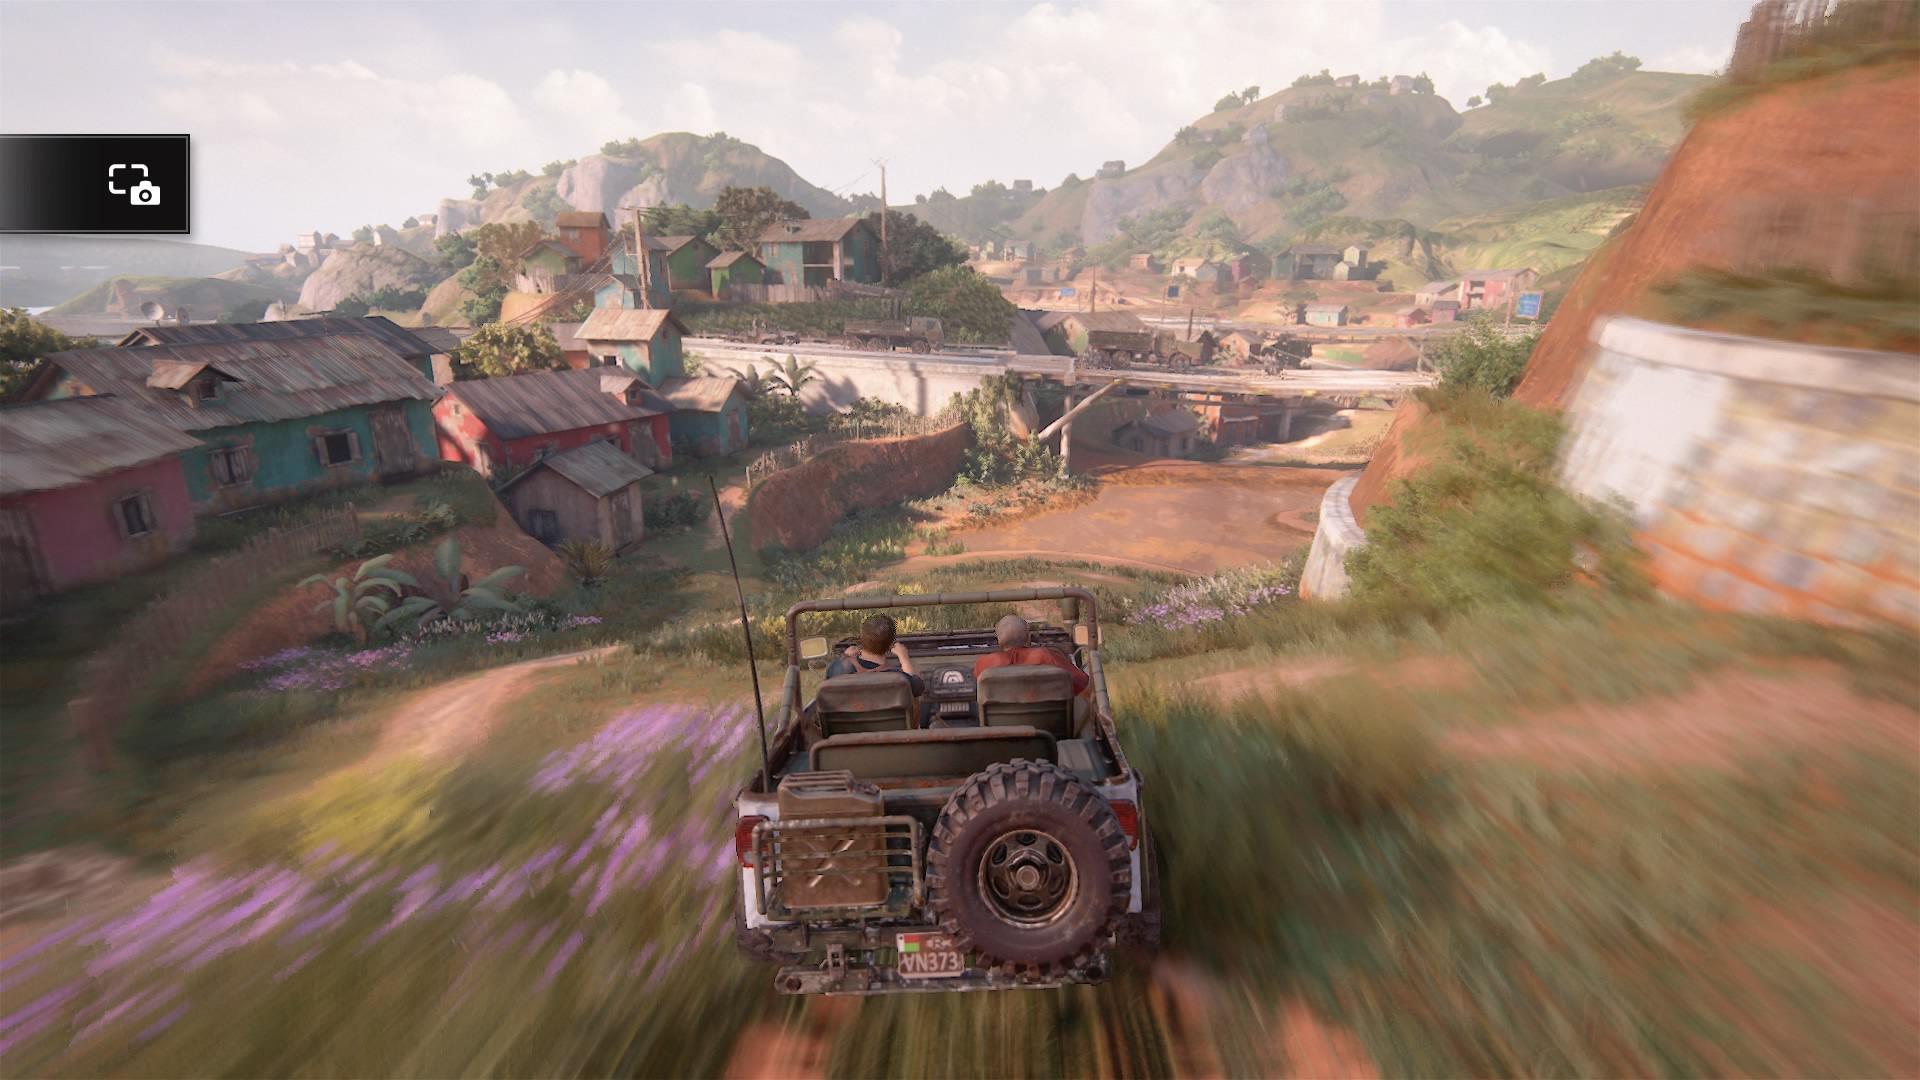 Uncharted 4: A Thief's End - Đánh Giá Game